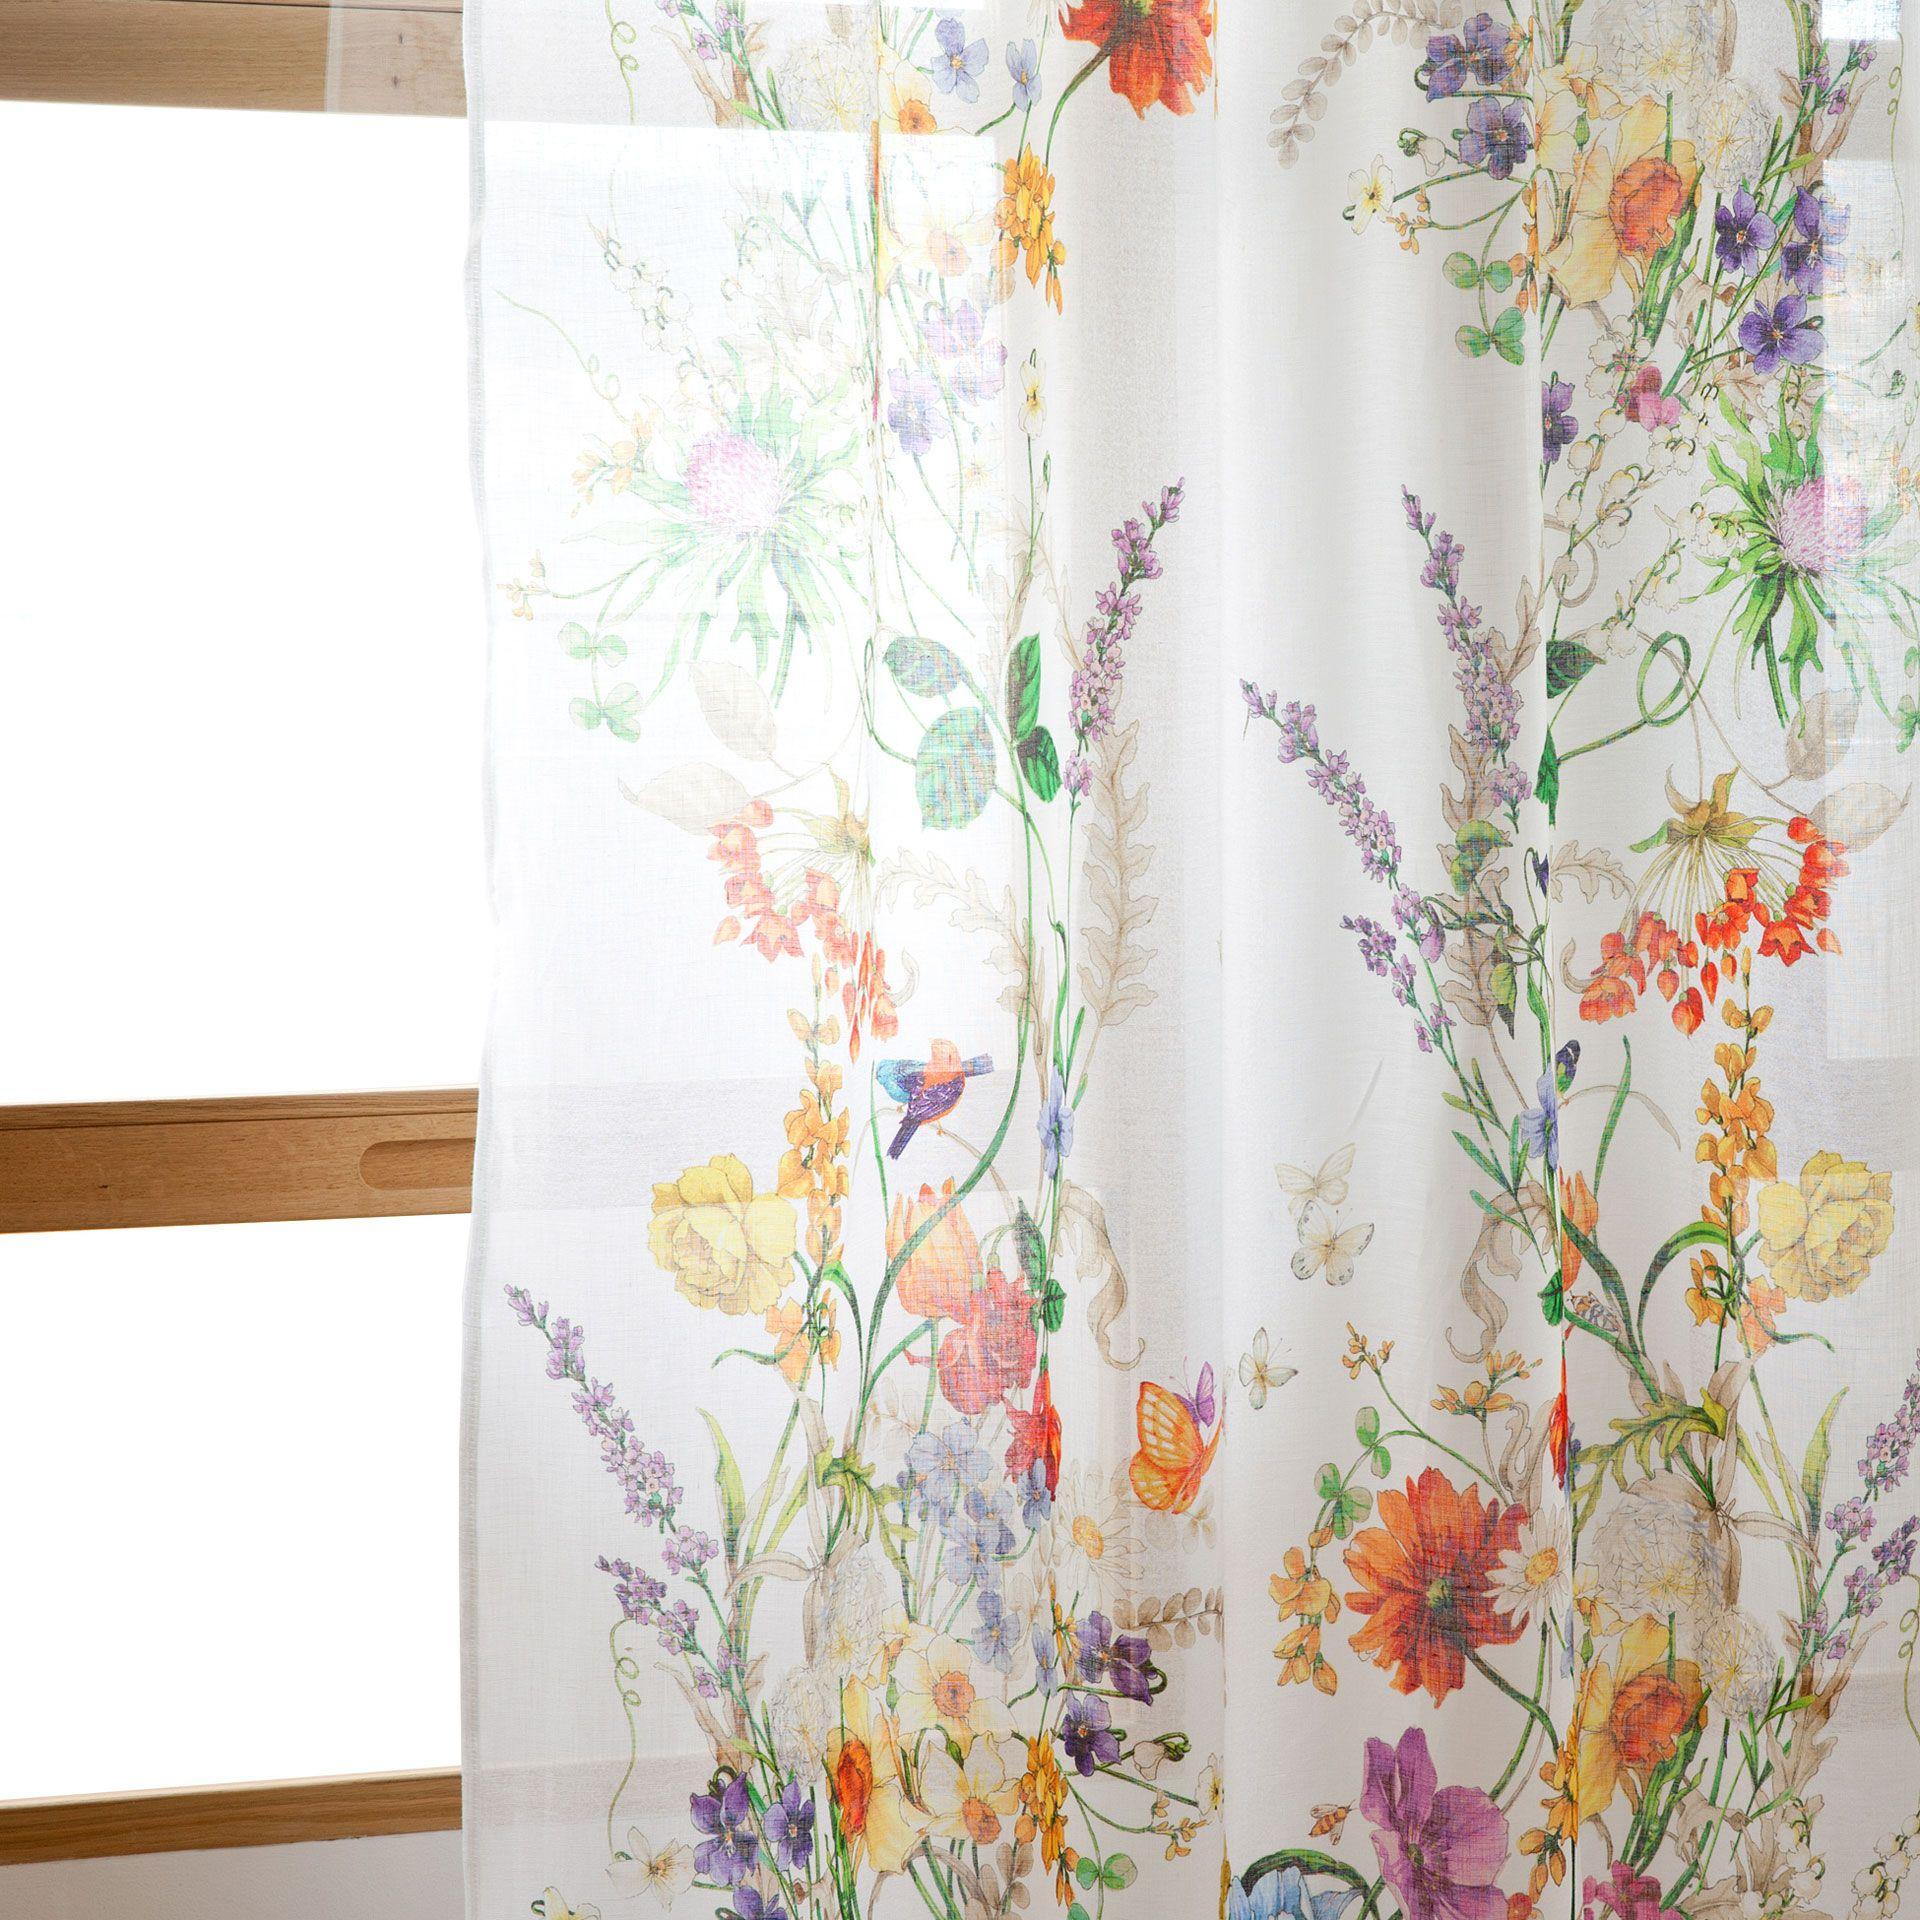 Perdea de in cu flori perdele decora iuni zara home for Zara home cortinas dormitorio